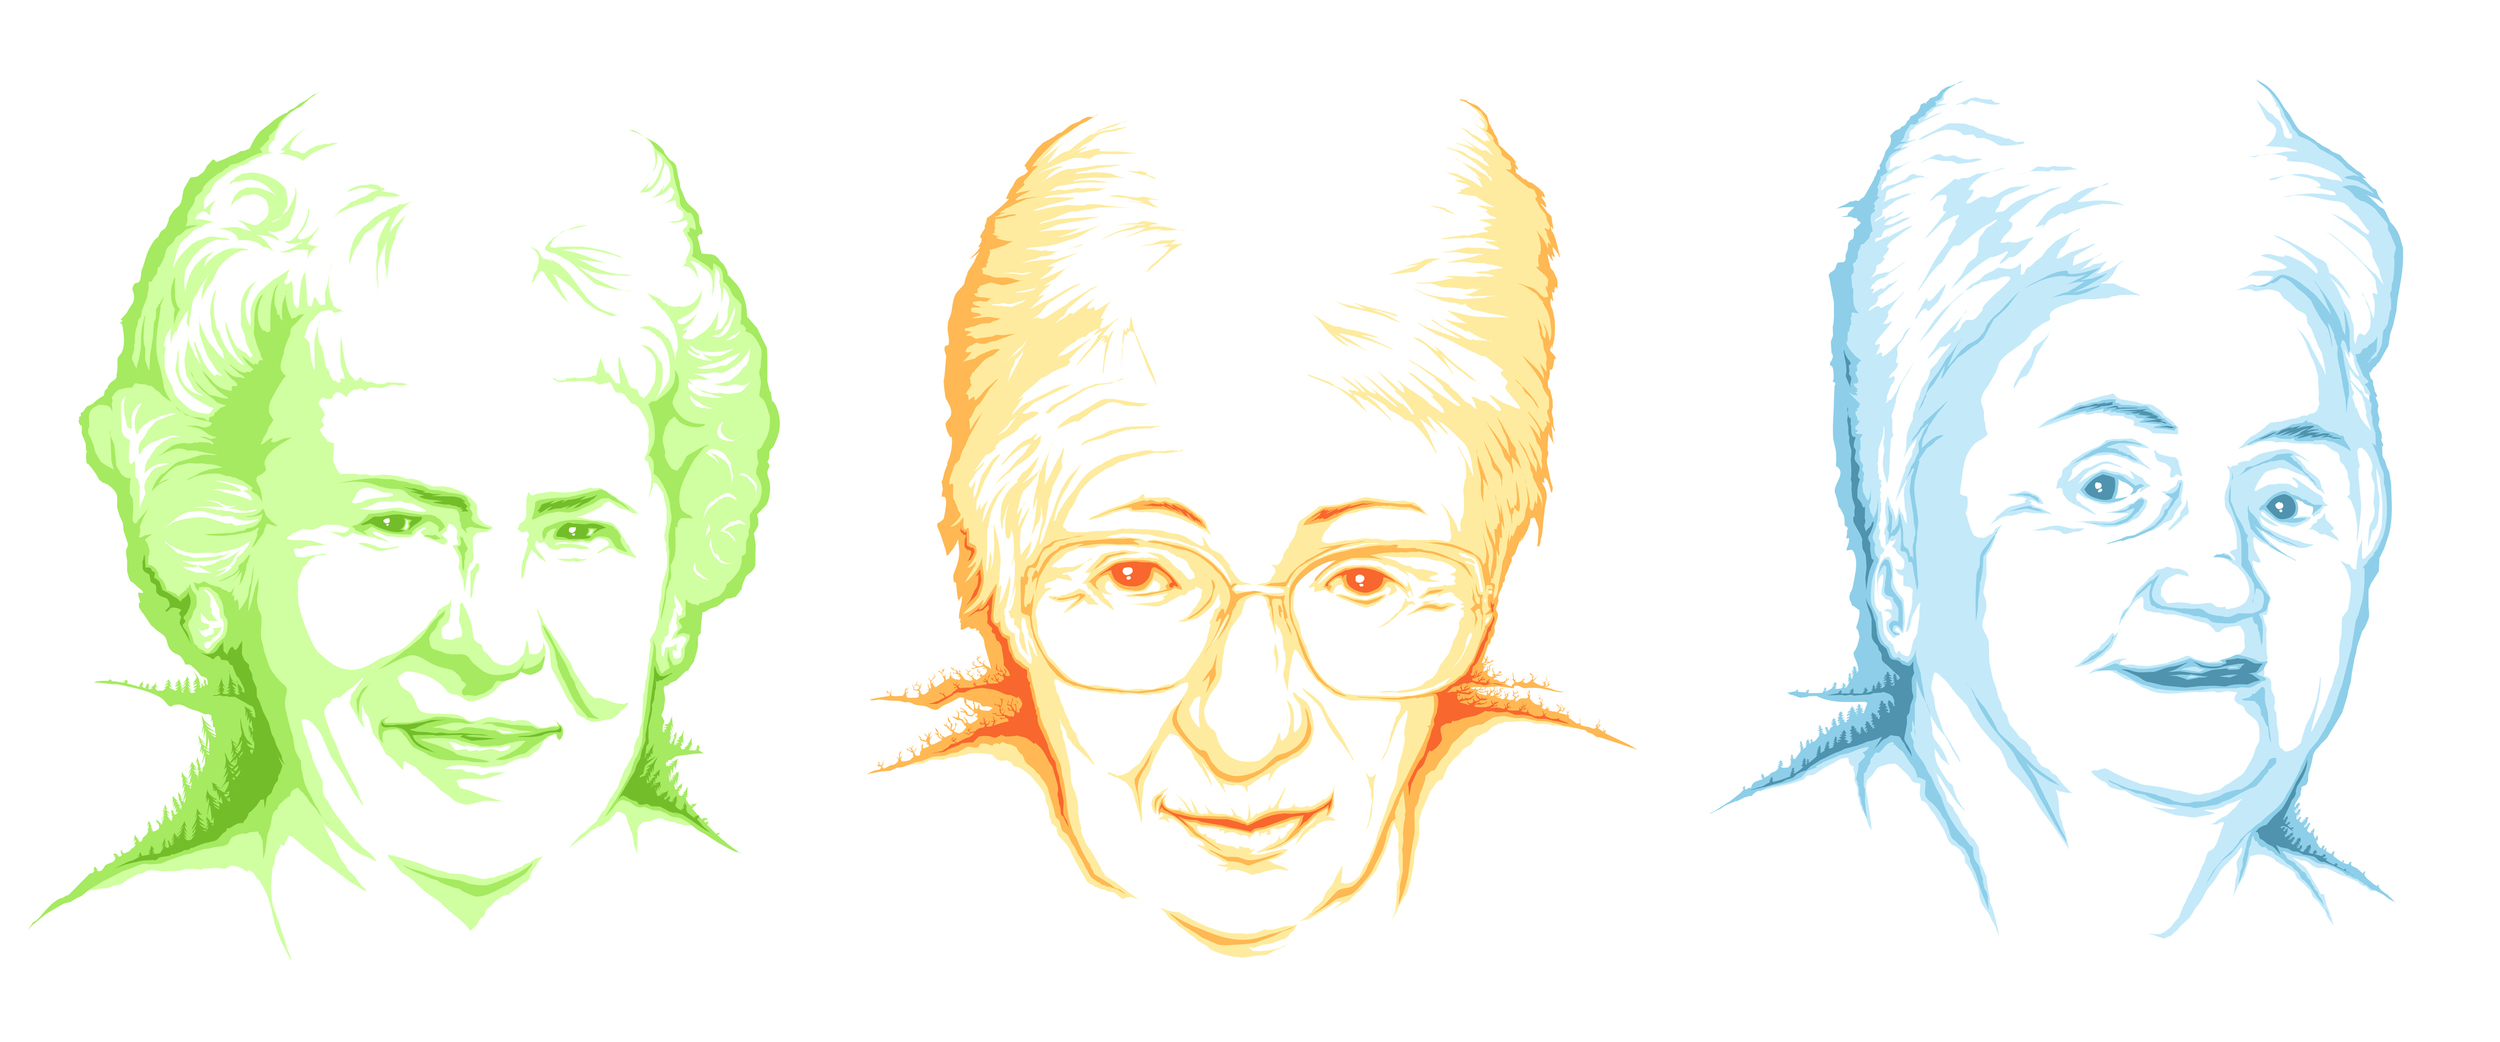 ...3 christmas portraits for 2013 of my grandmothers...